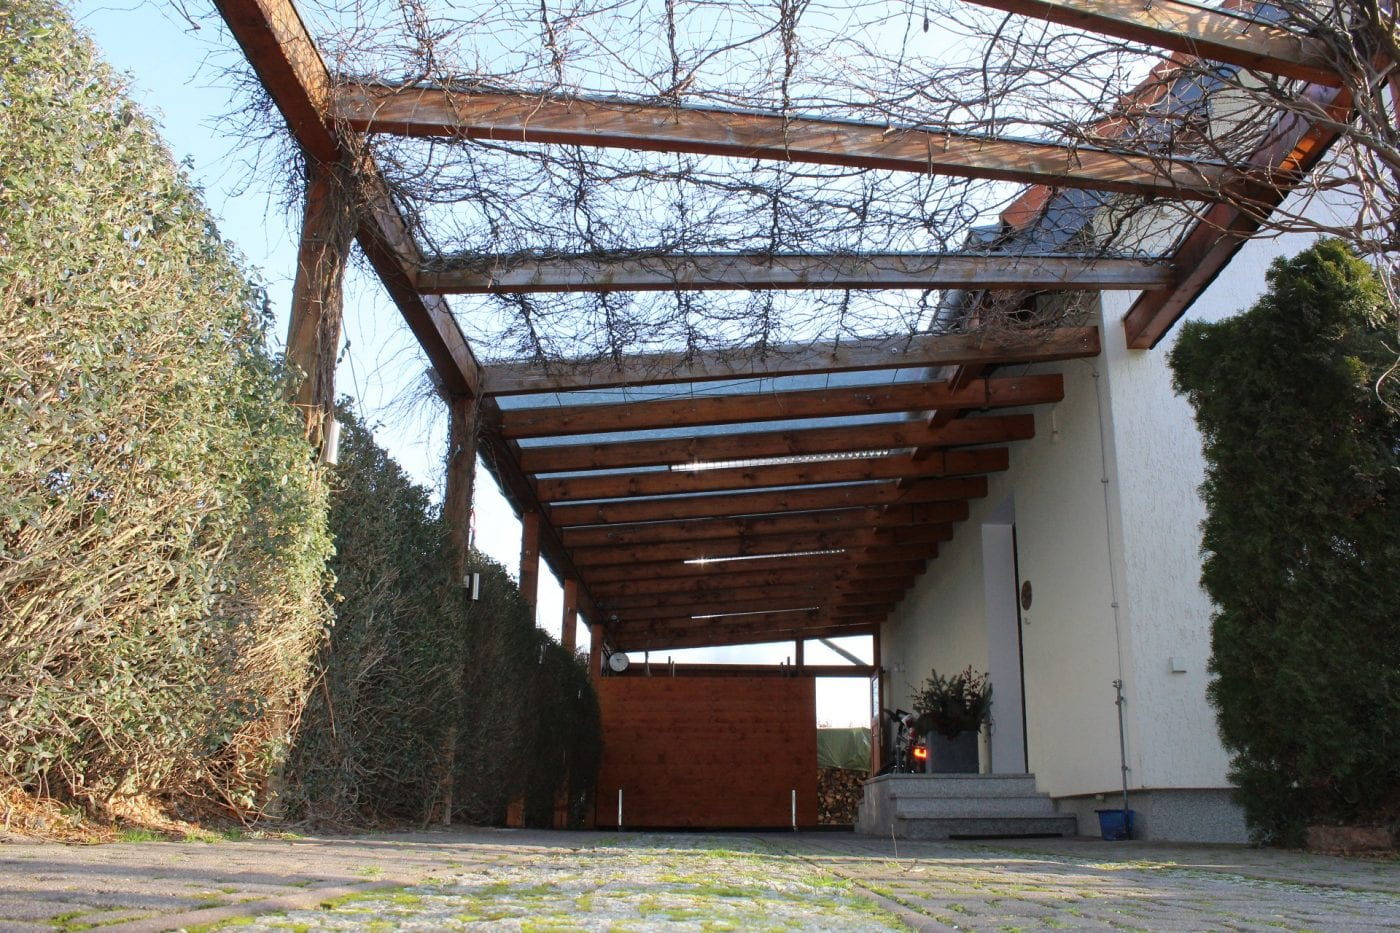 carport_verglast_frankenheim (4)